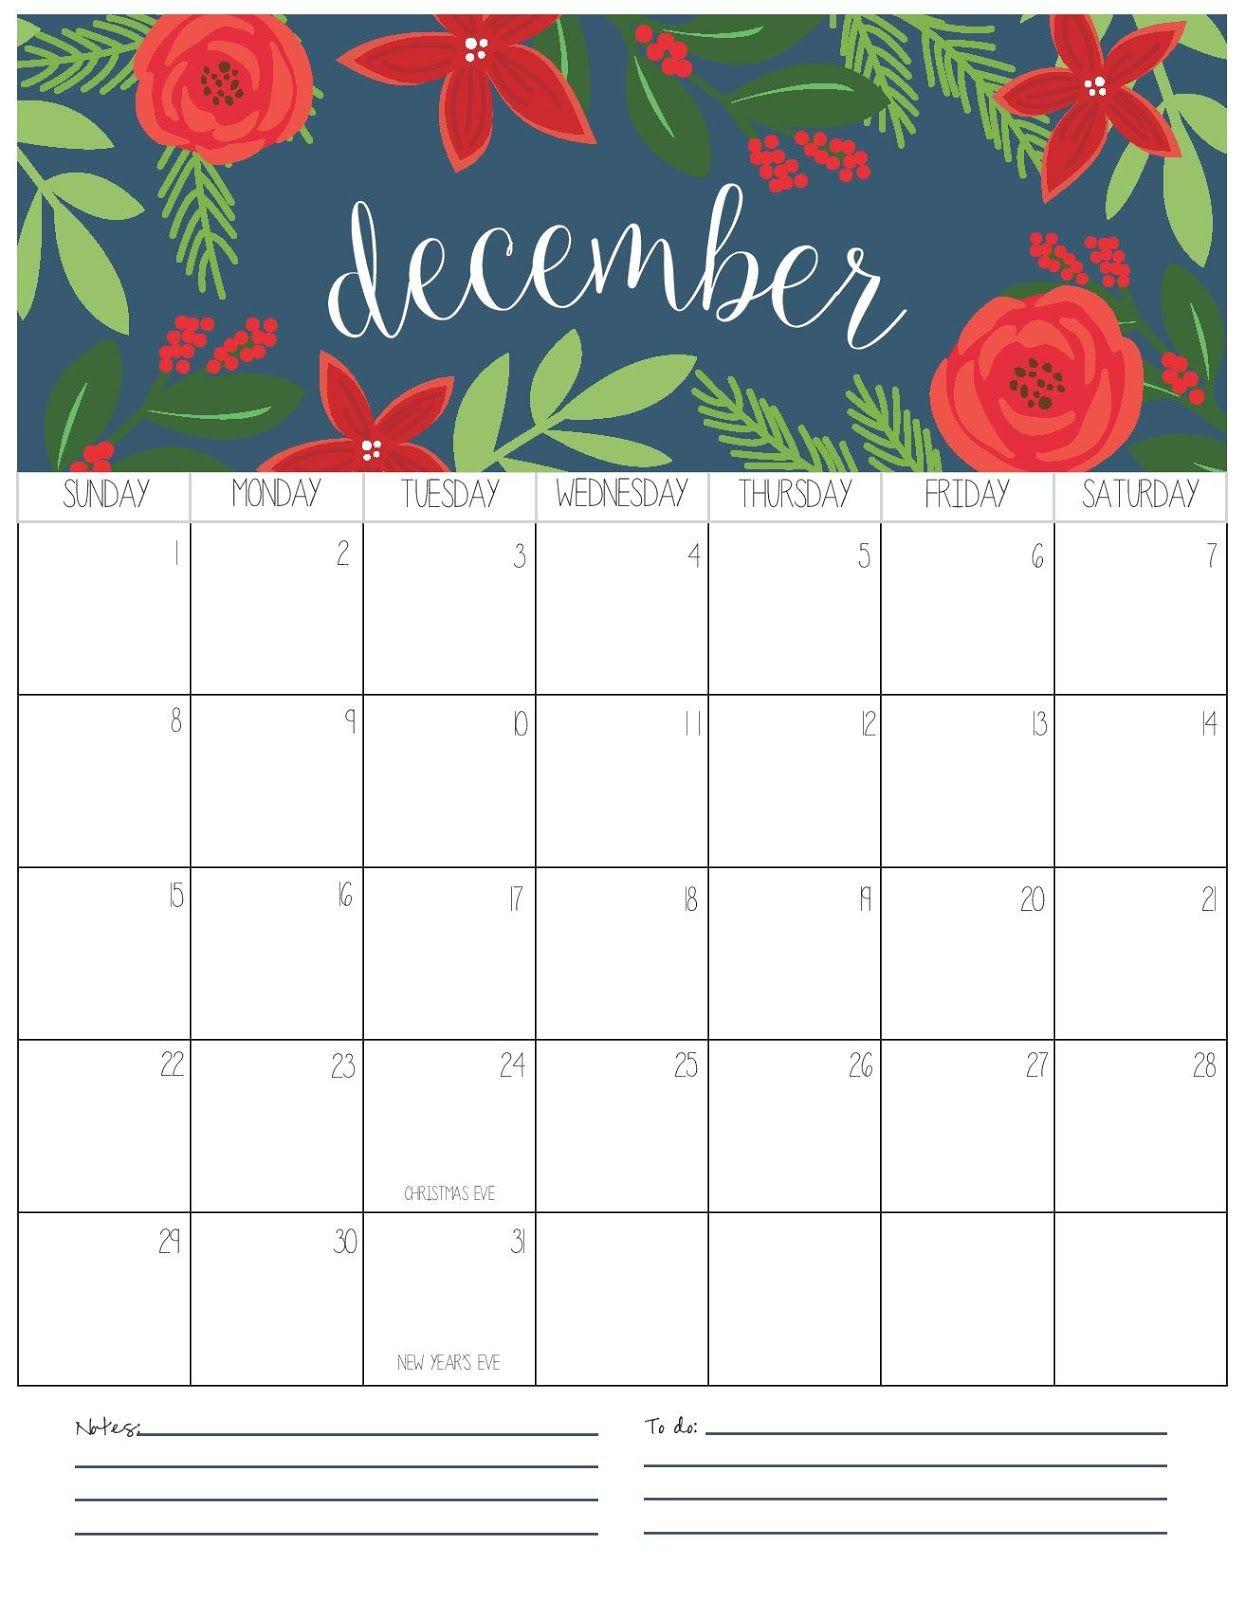 Calendrier Avent Kinder 2020.Kalender 2019 Zum Ausdrucken Fur Kinder Pencetakan Desain